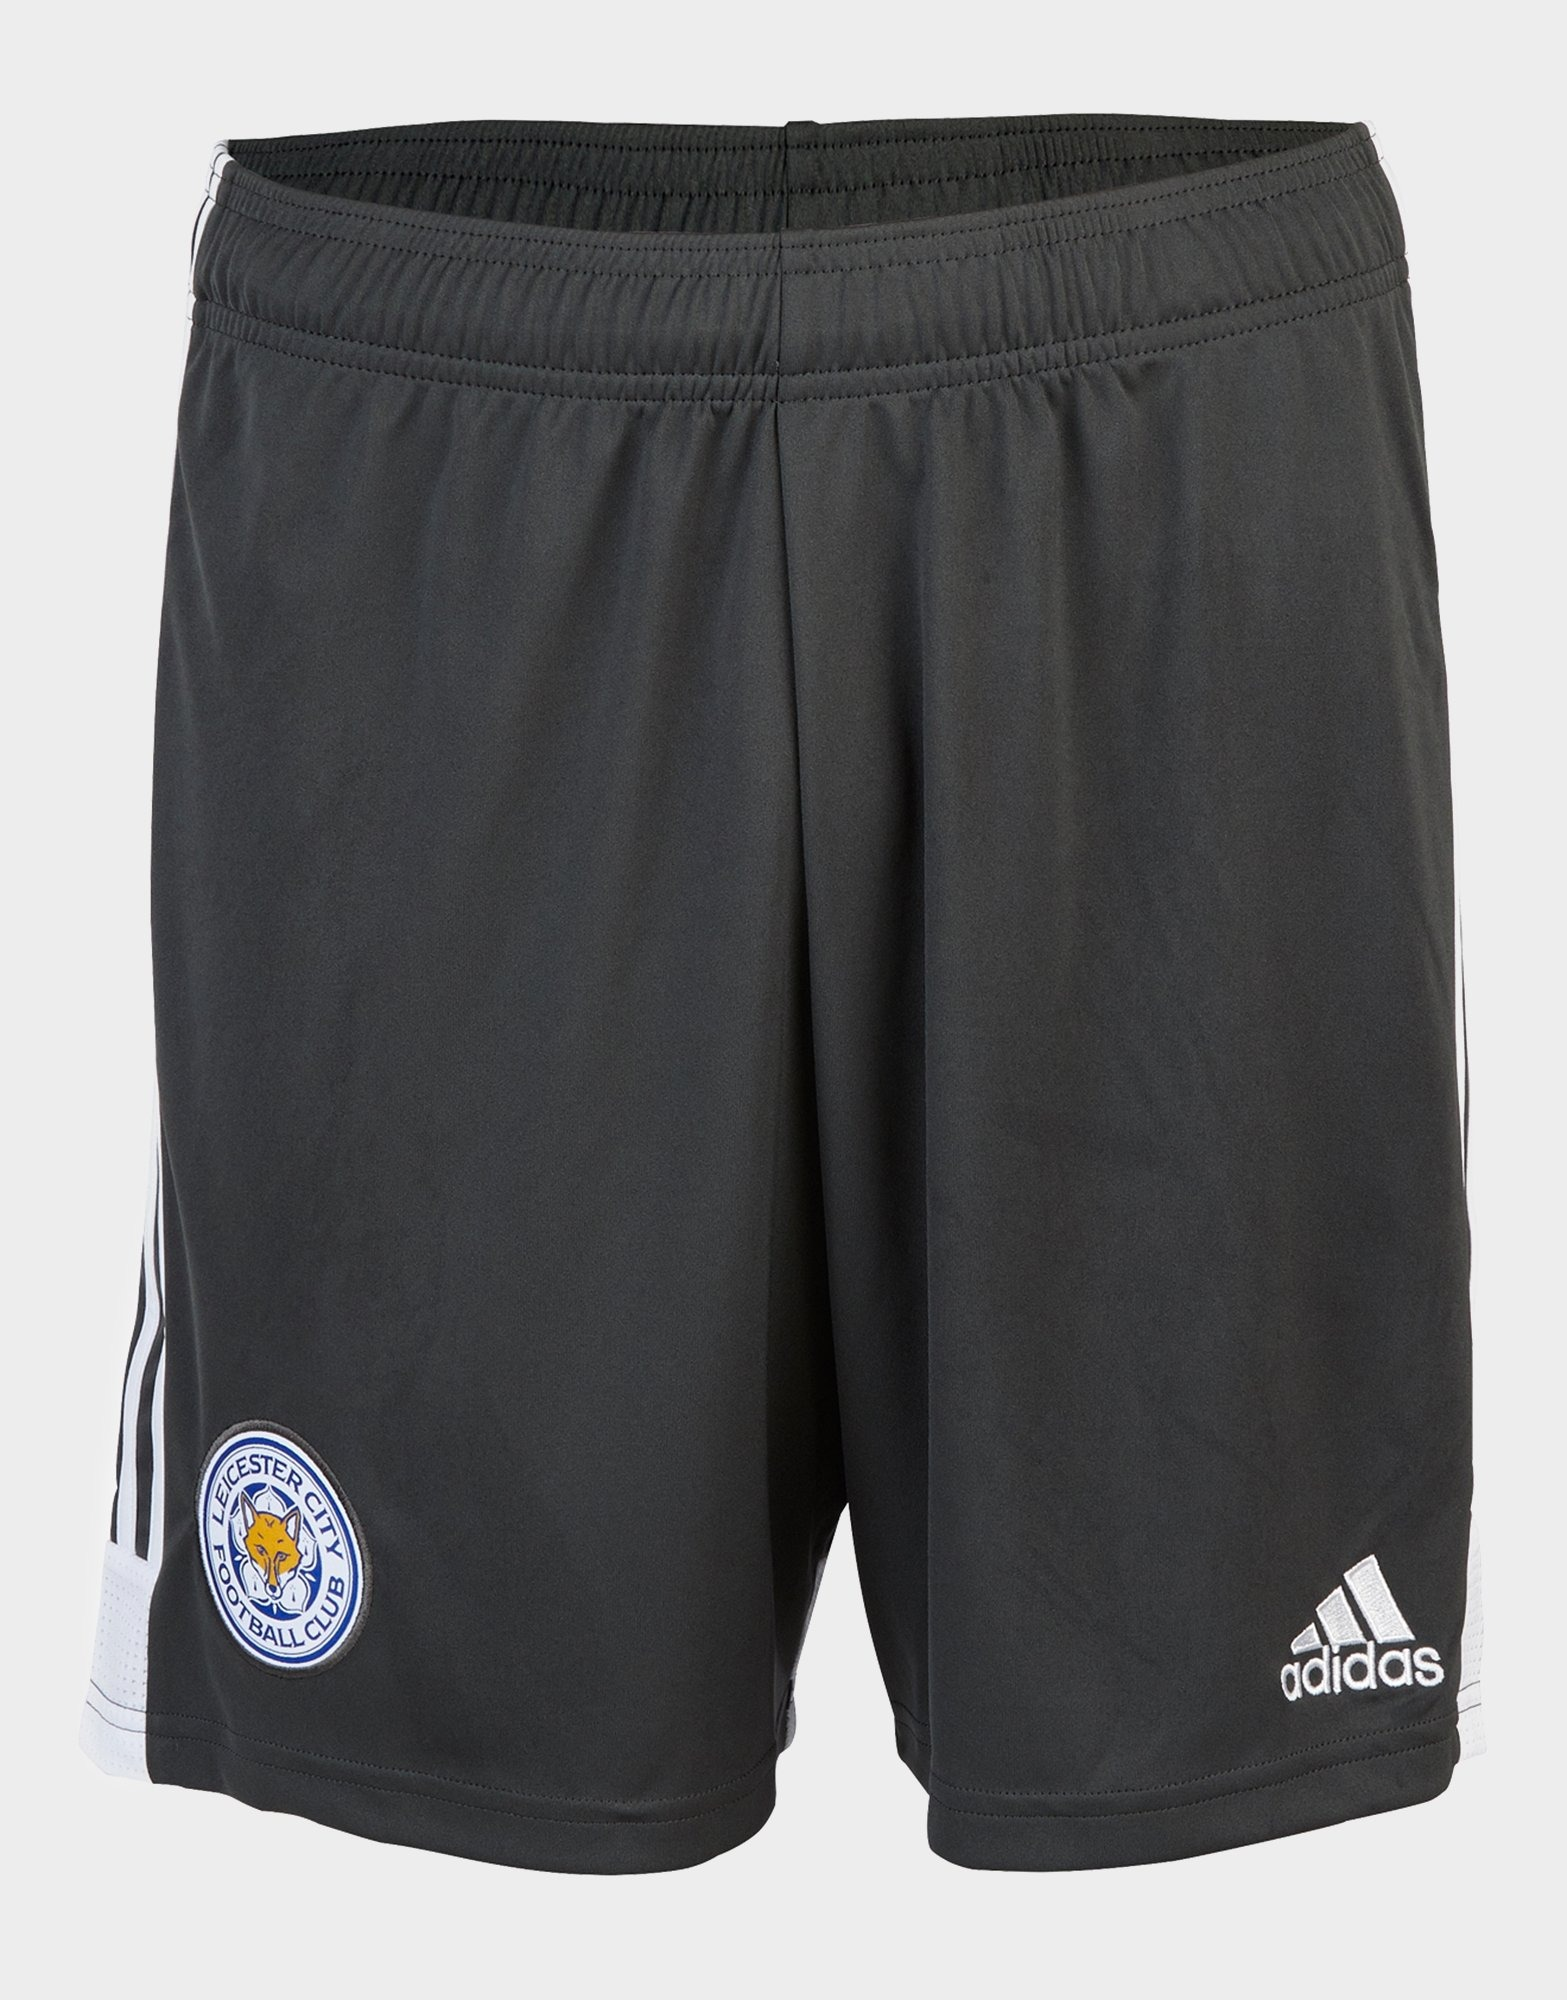 adidas Leicester City FC 201920 Terzi Shorts Junior | JD Sports